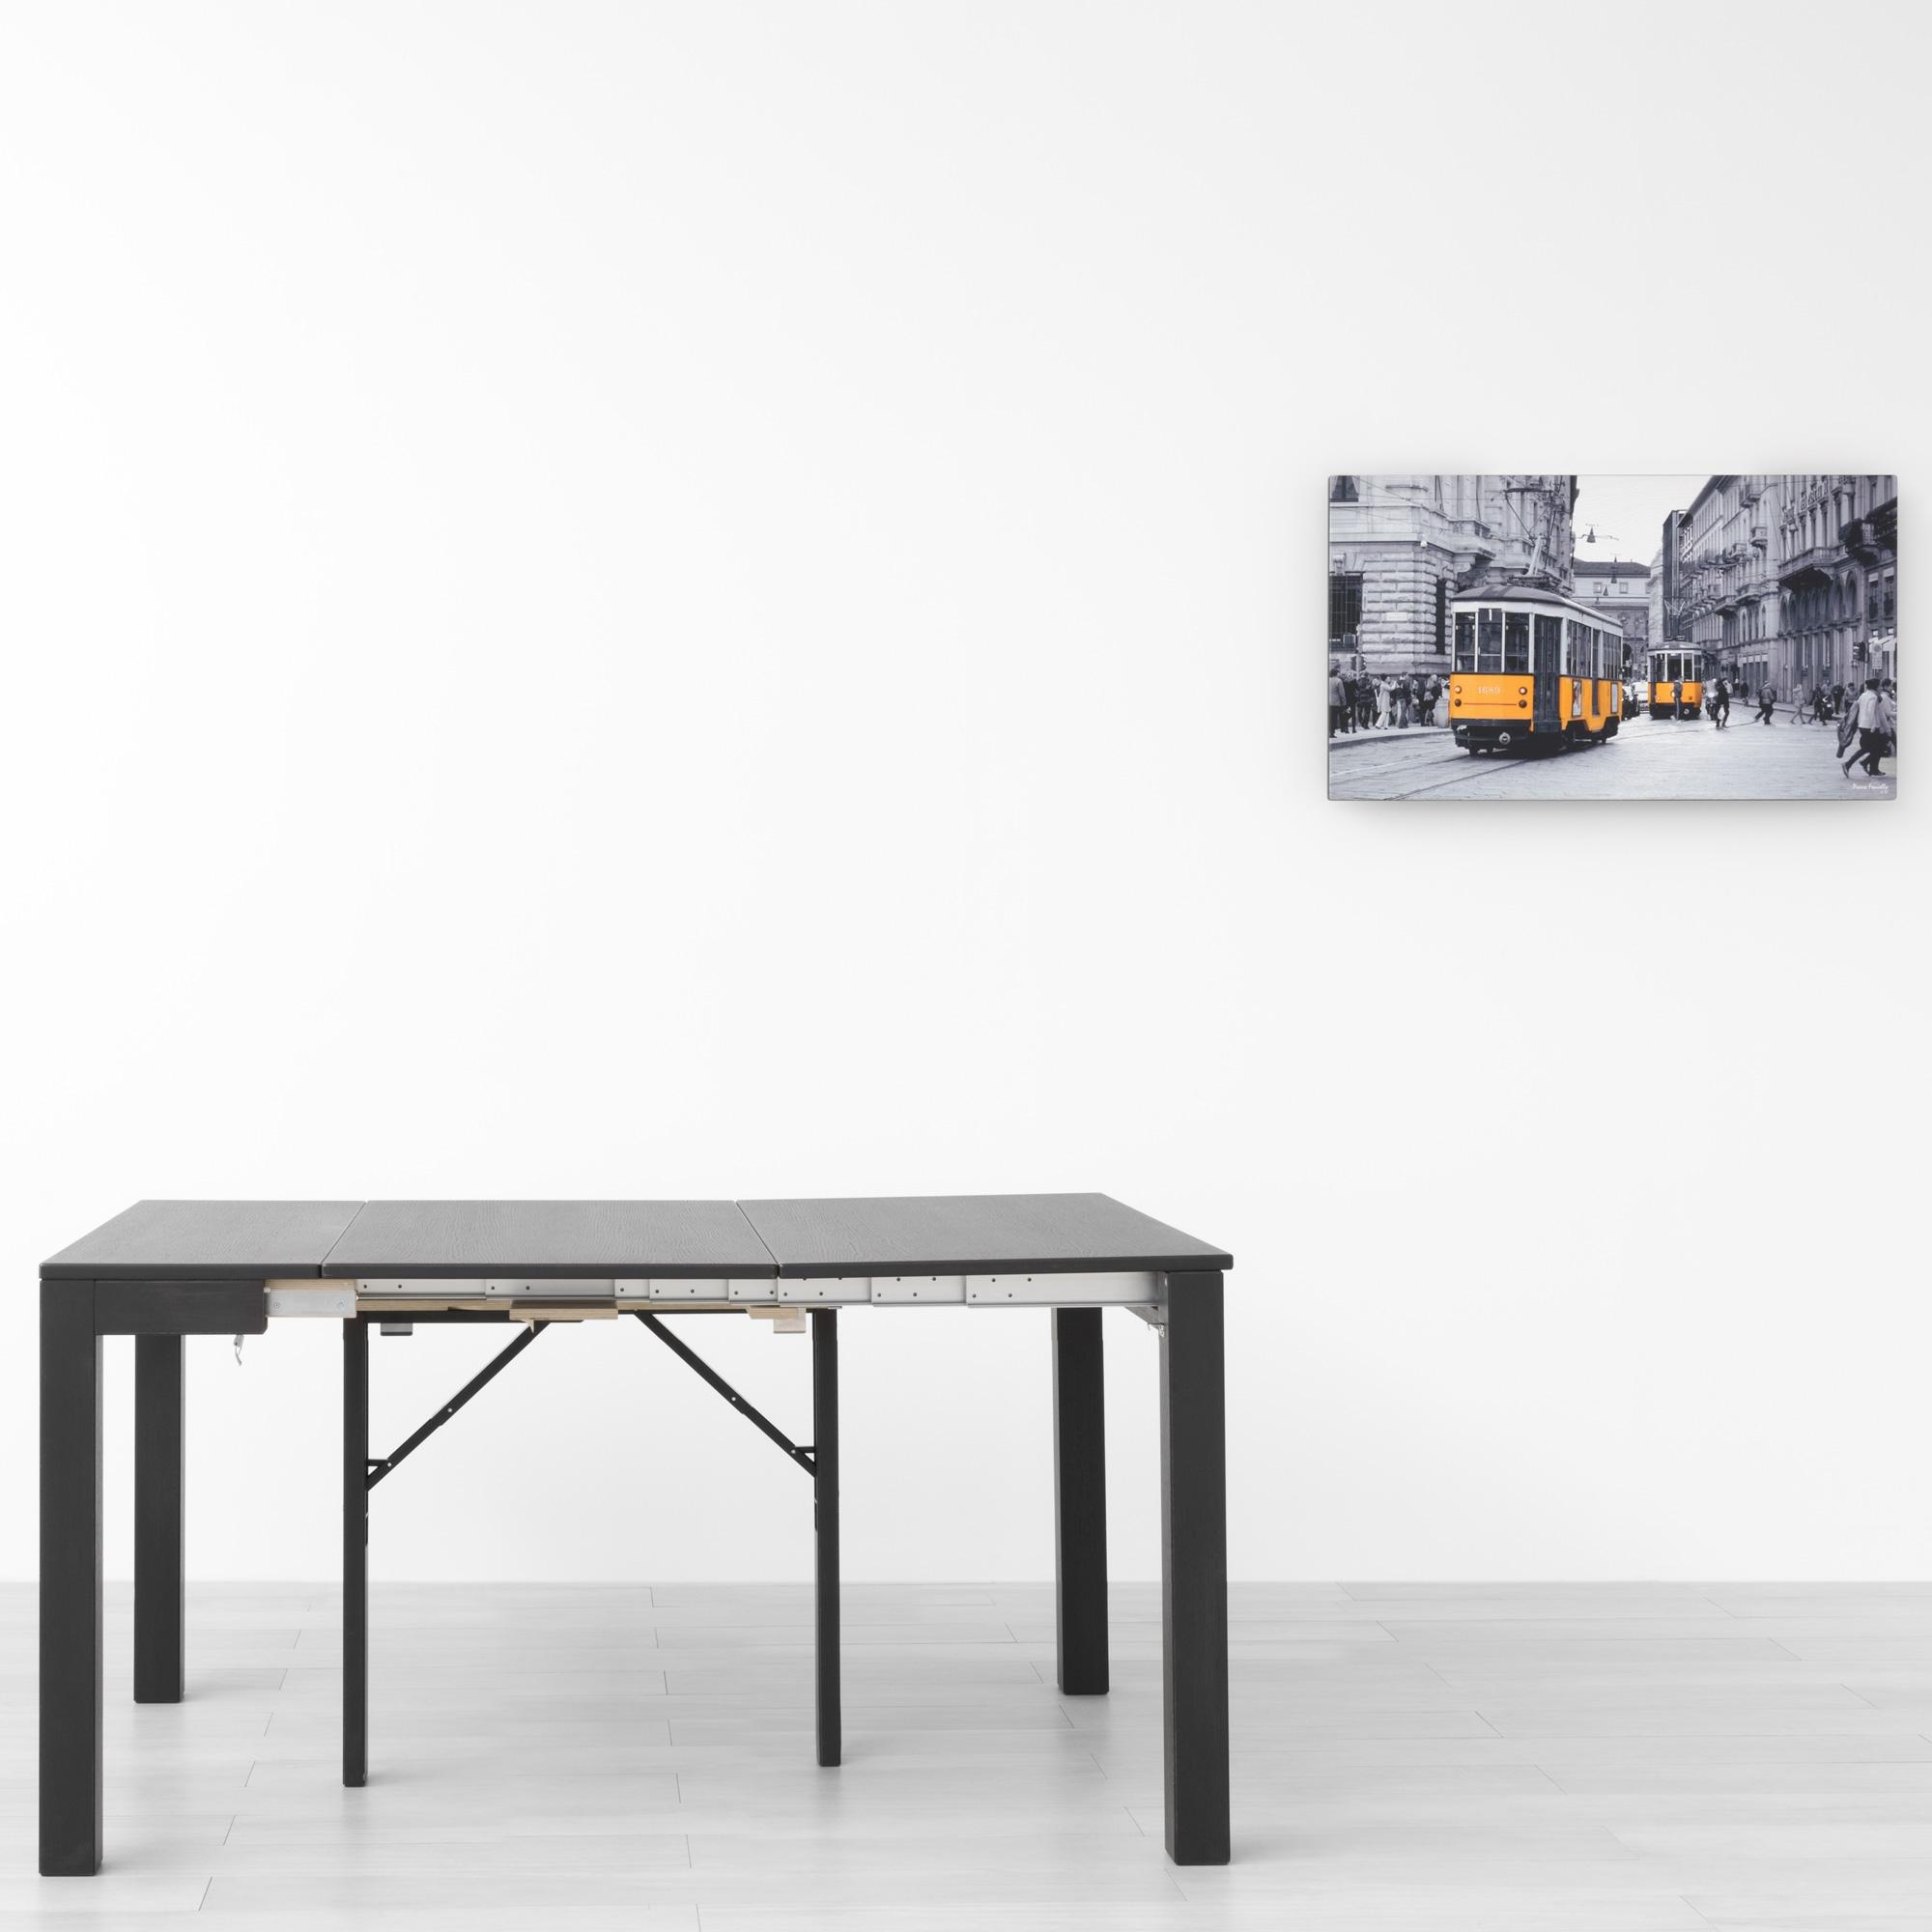 Tavolo consolle allungabile 10 posti tavoli a prezzi - Tavolo allungabile a consolle ...